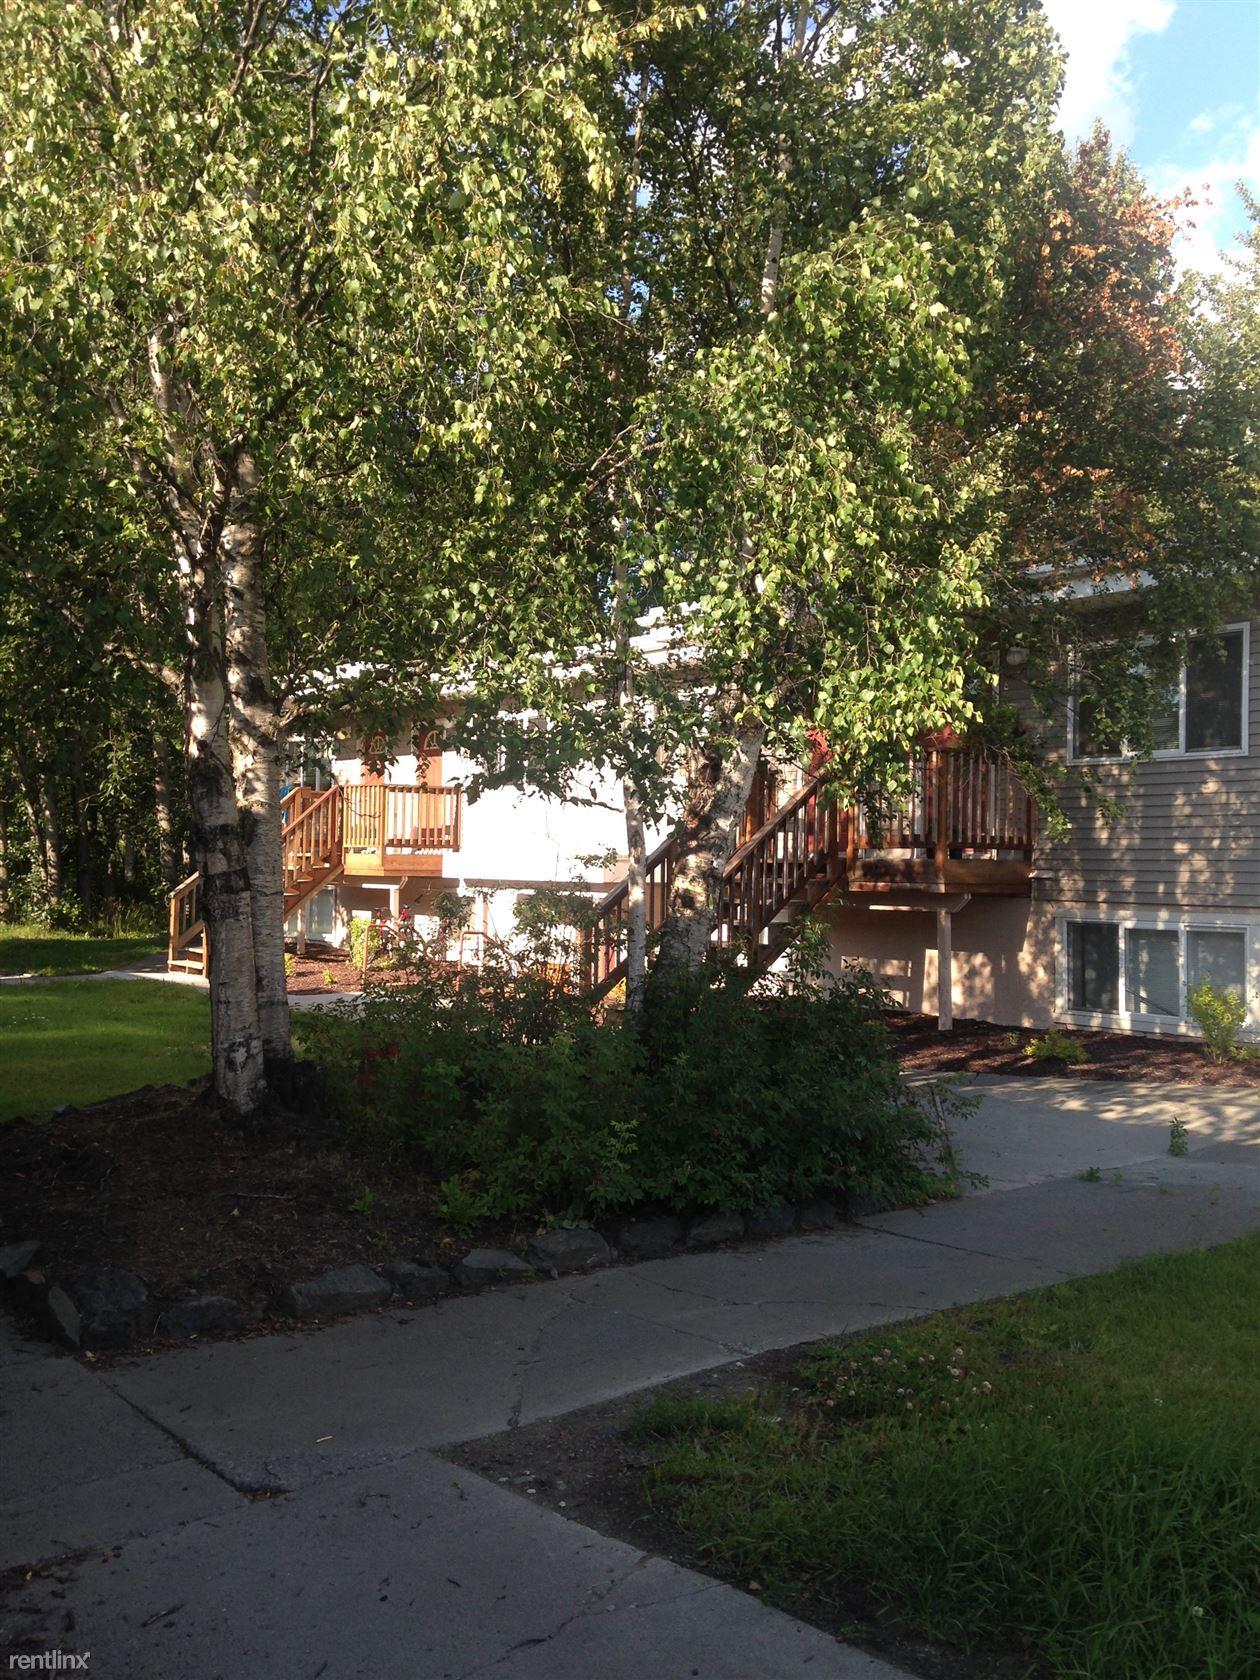 3137 Raspberry Rd Apt 8, Anchorage, AK - 950 USD/ month